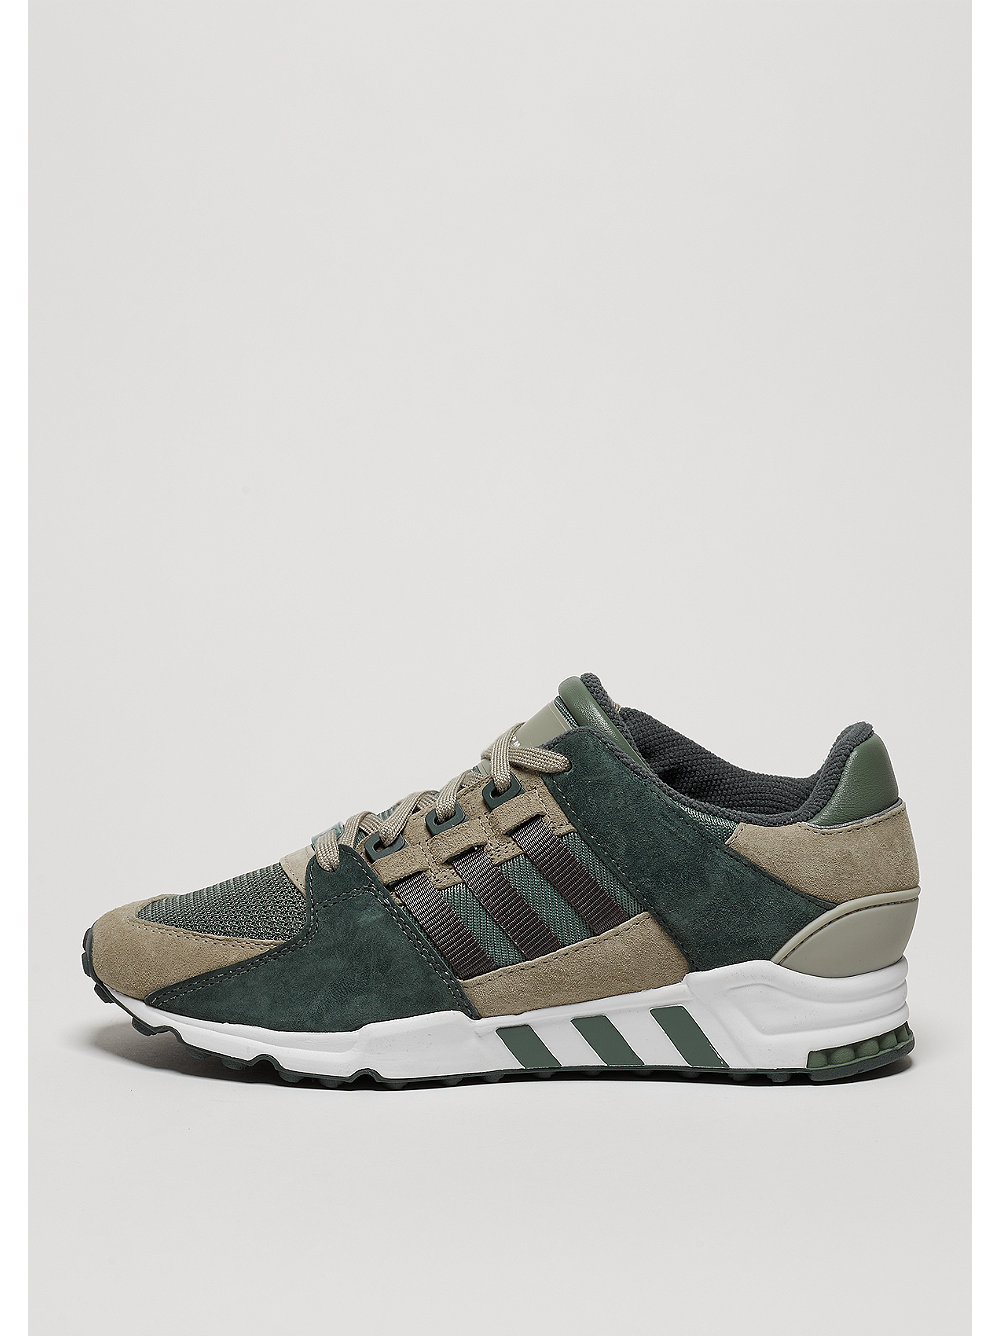 adidas EQT Cushion ADV News: Sneaker Magazine